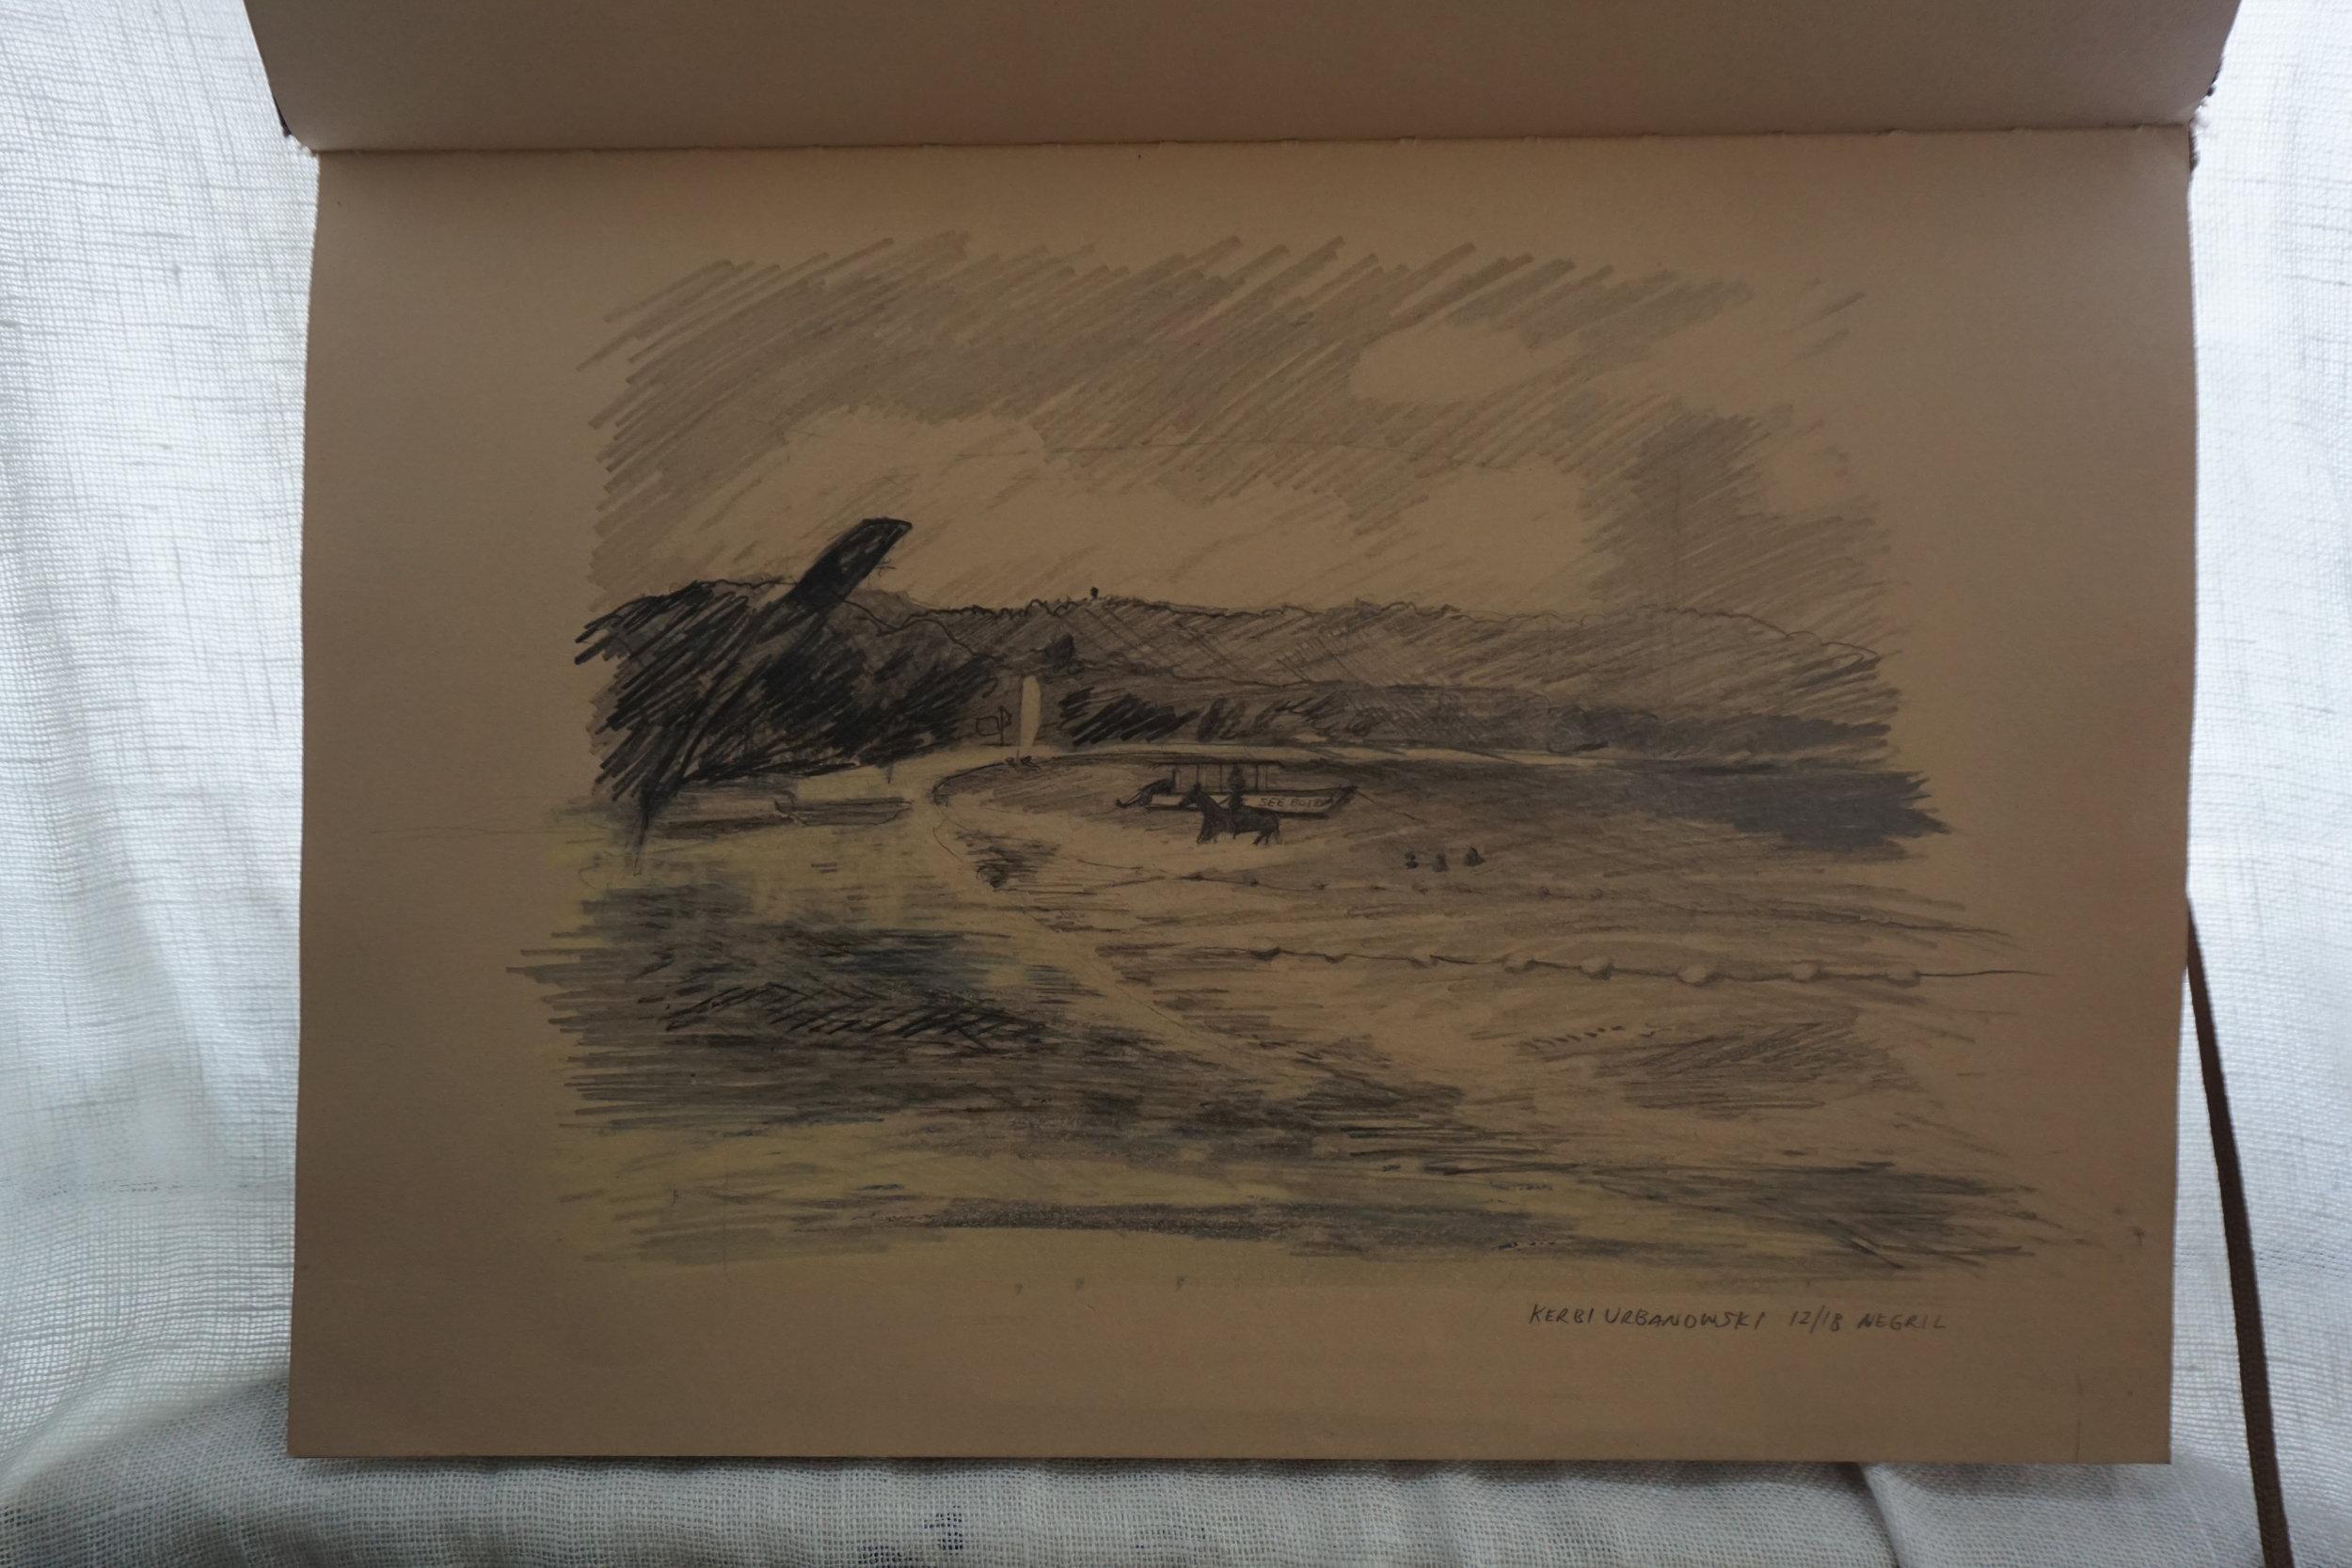 kerbi-urbanowski-jamaica-sketchbook-tourism-horseback